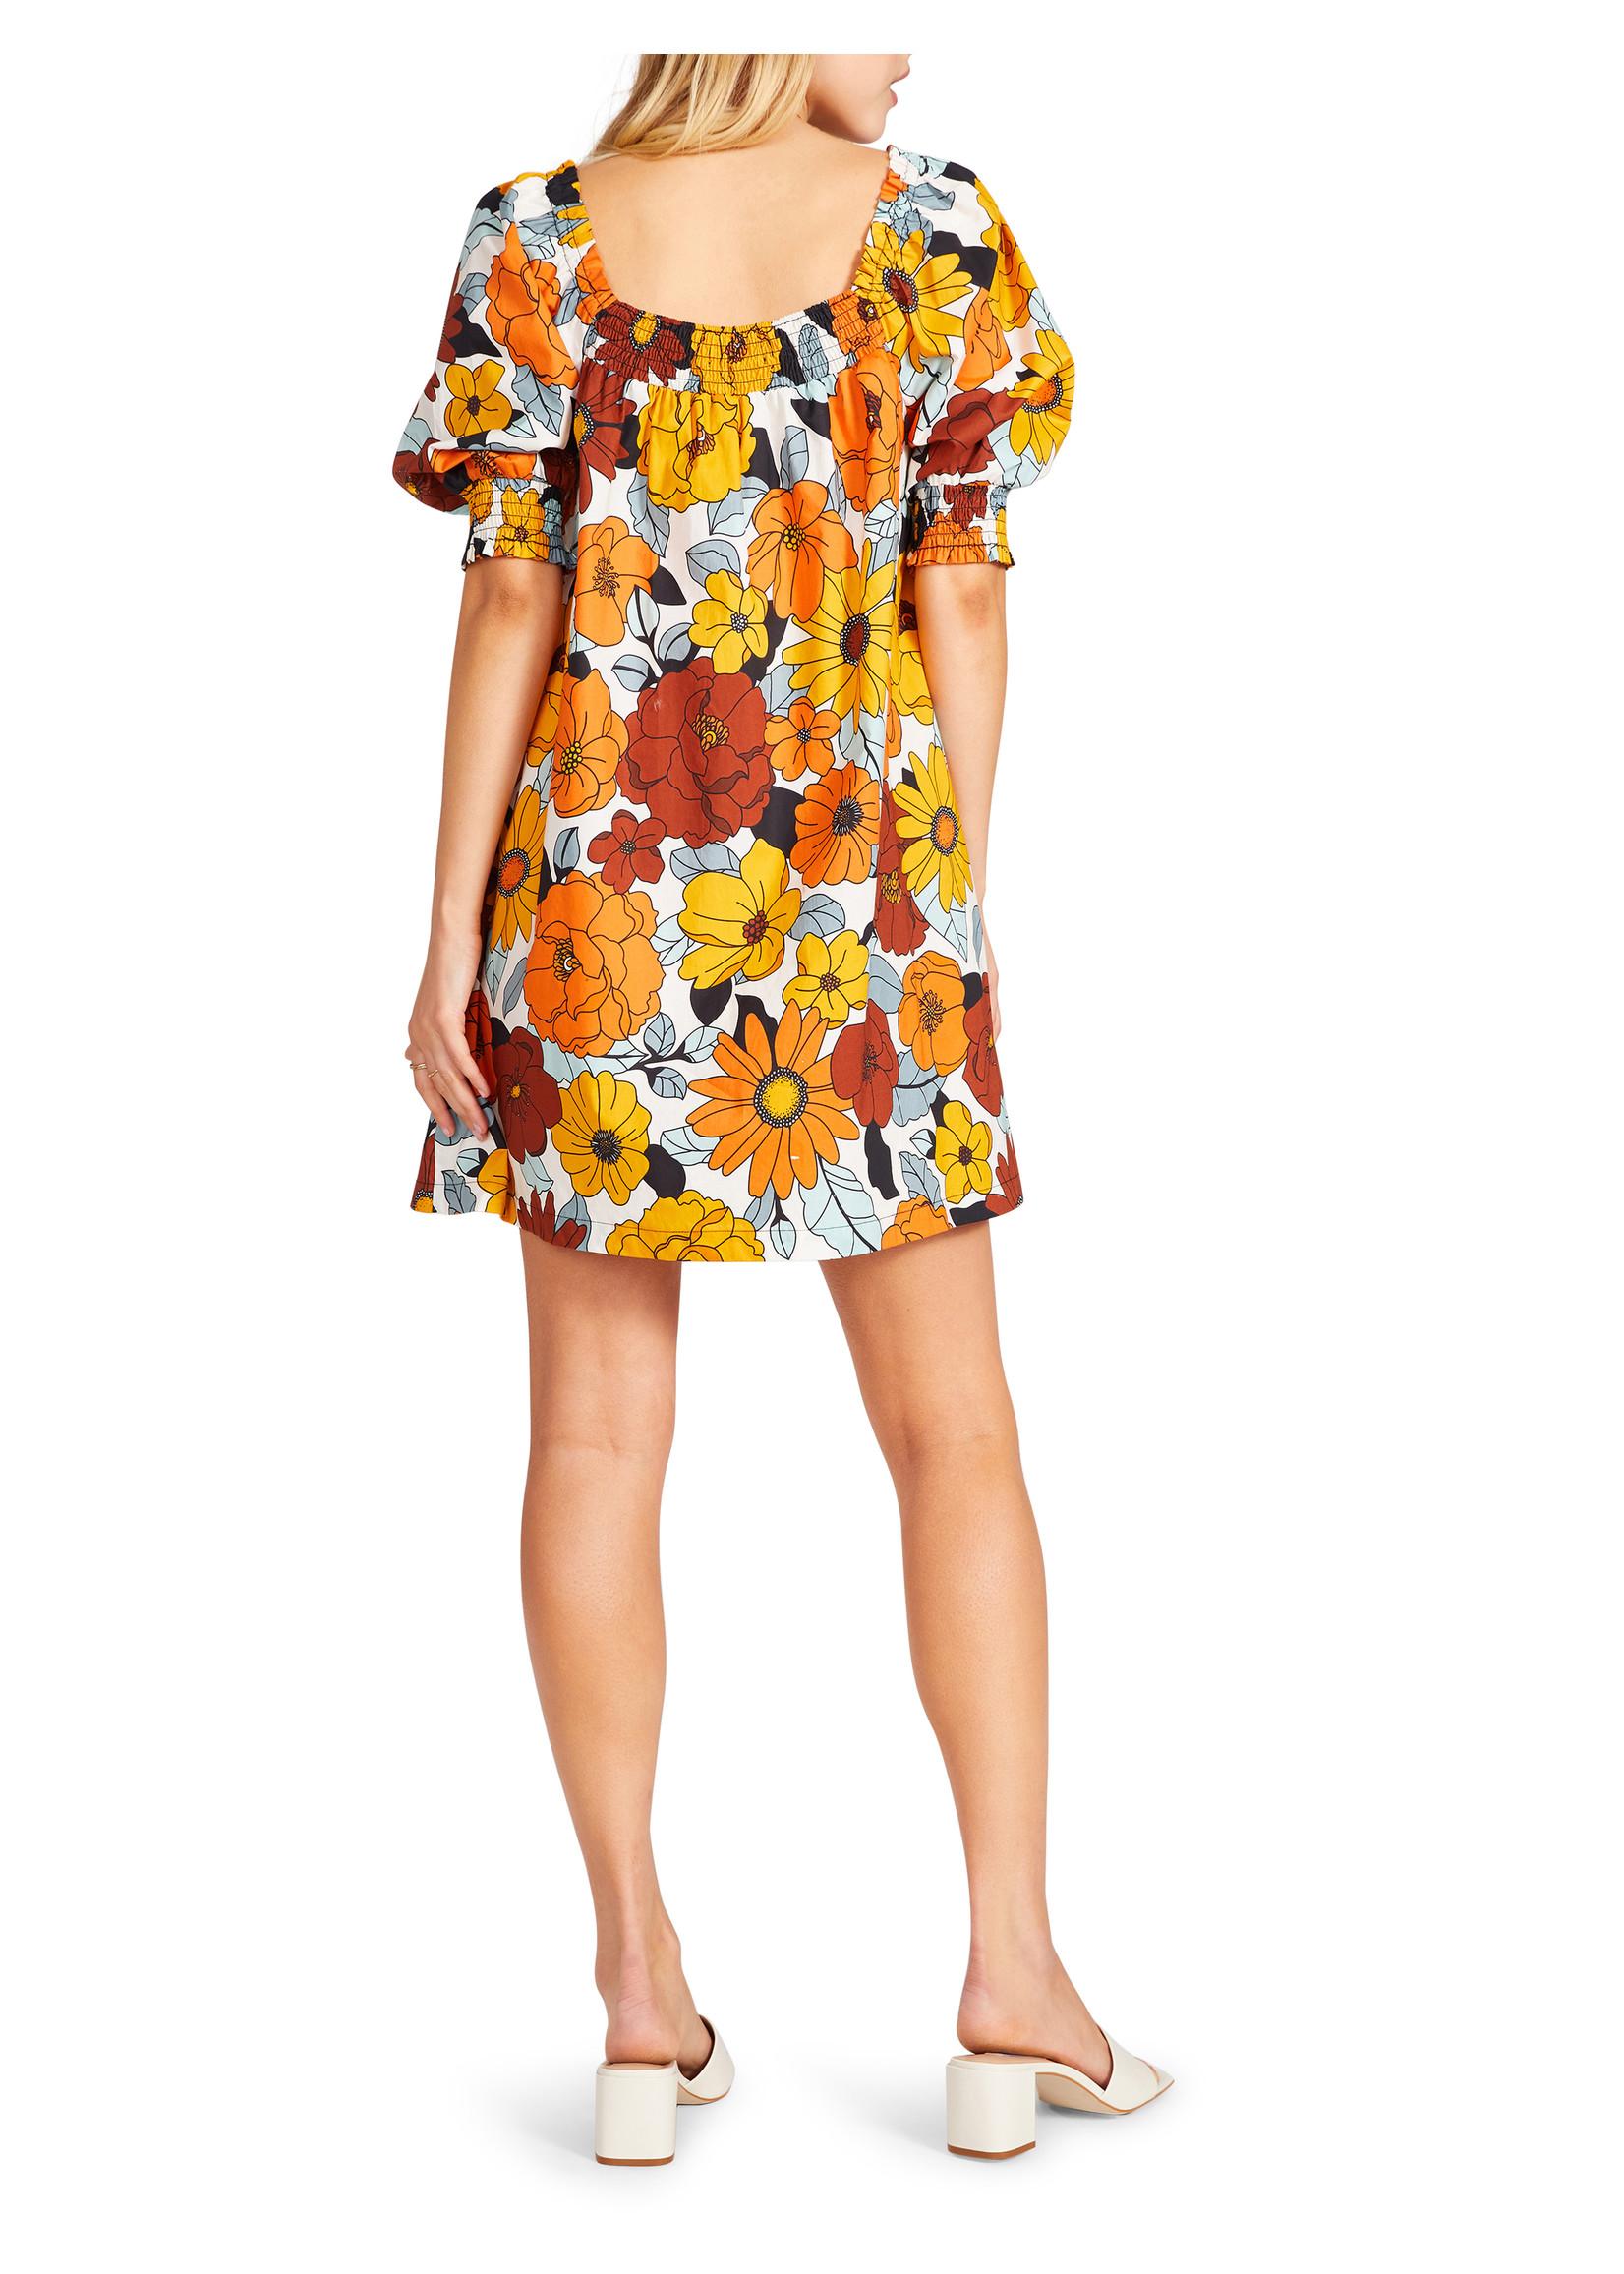 BB Dakota Vacay Mode Dress - BL208136